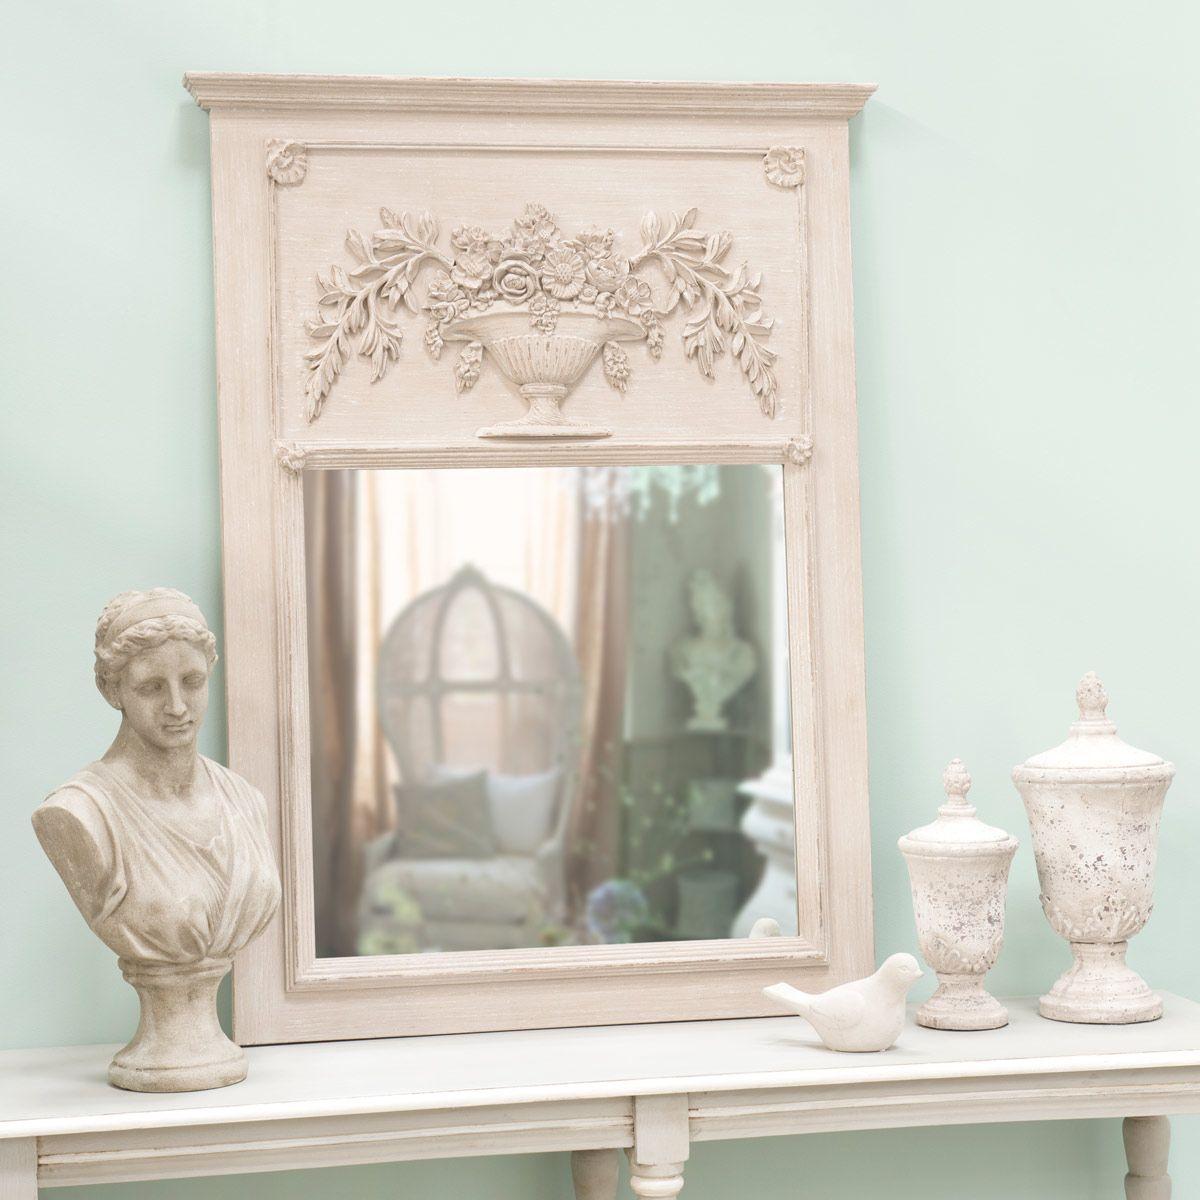 Trumeau Spiegel Berlioz All About Home Pinterest # Meubles De Tele Berlioz